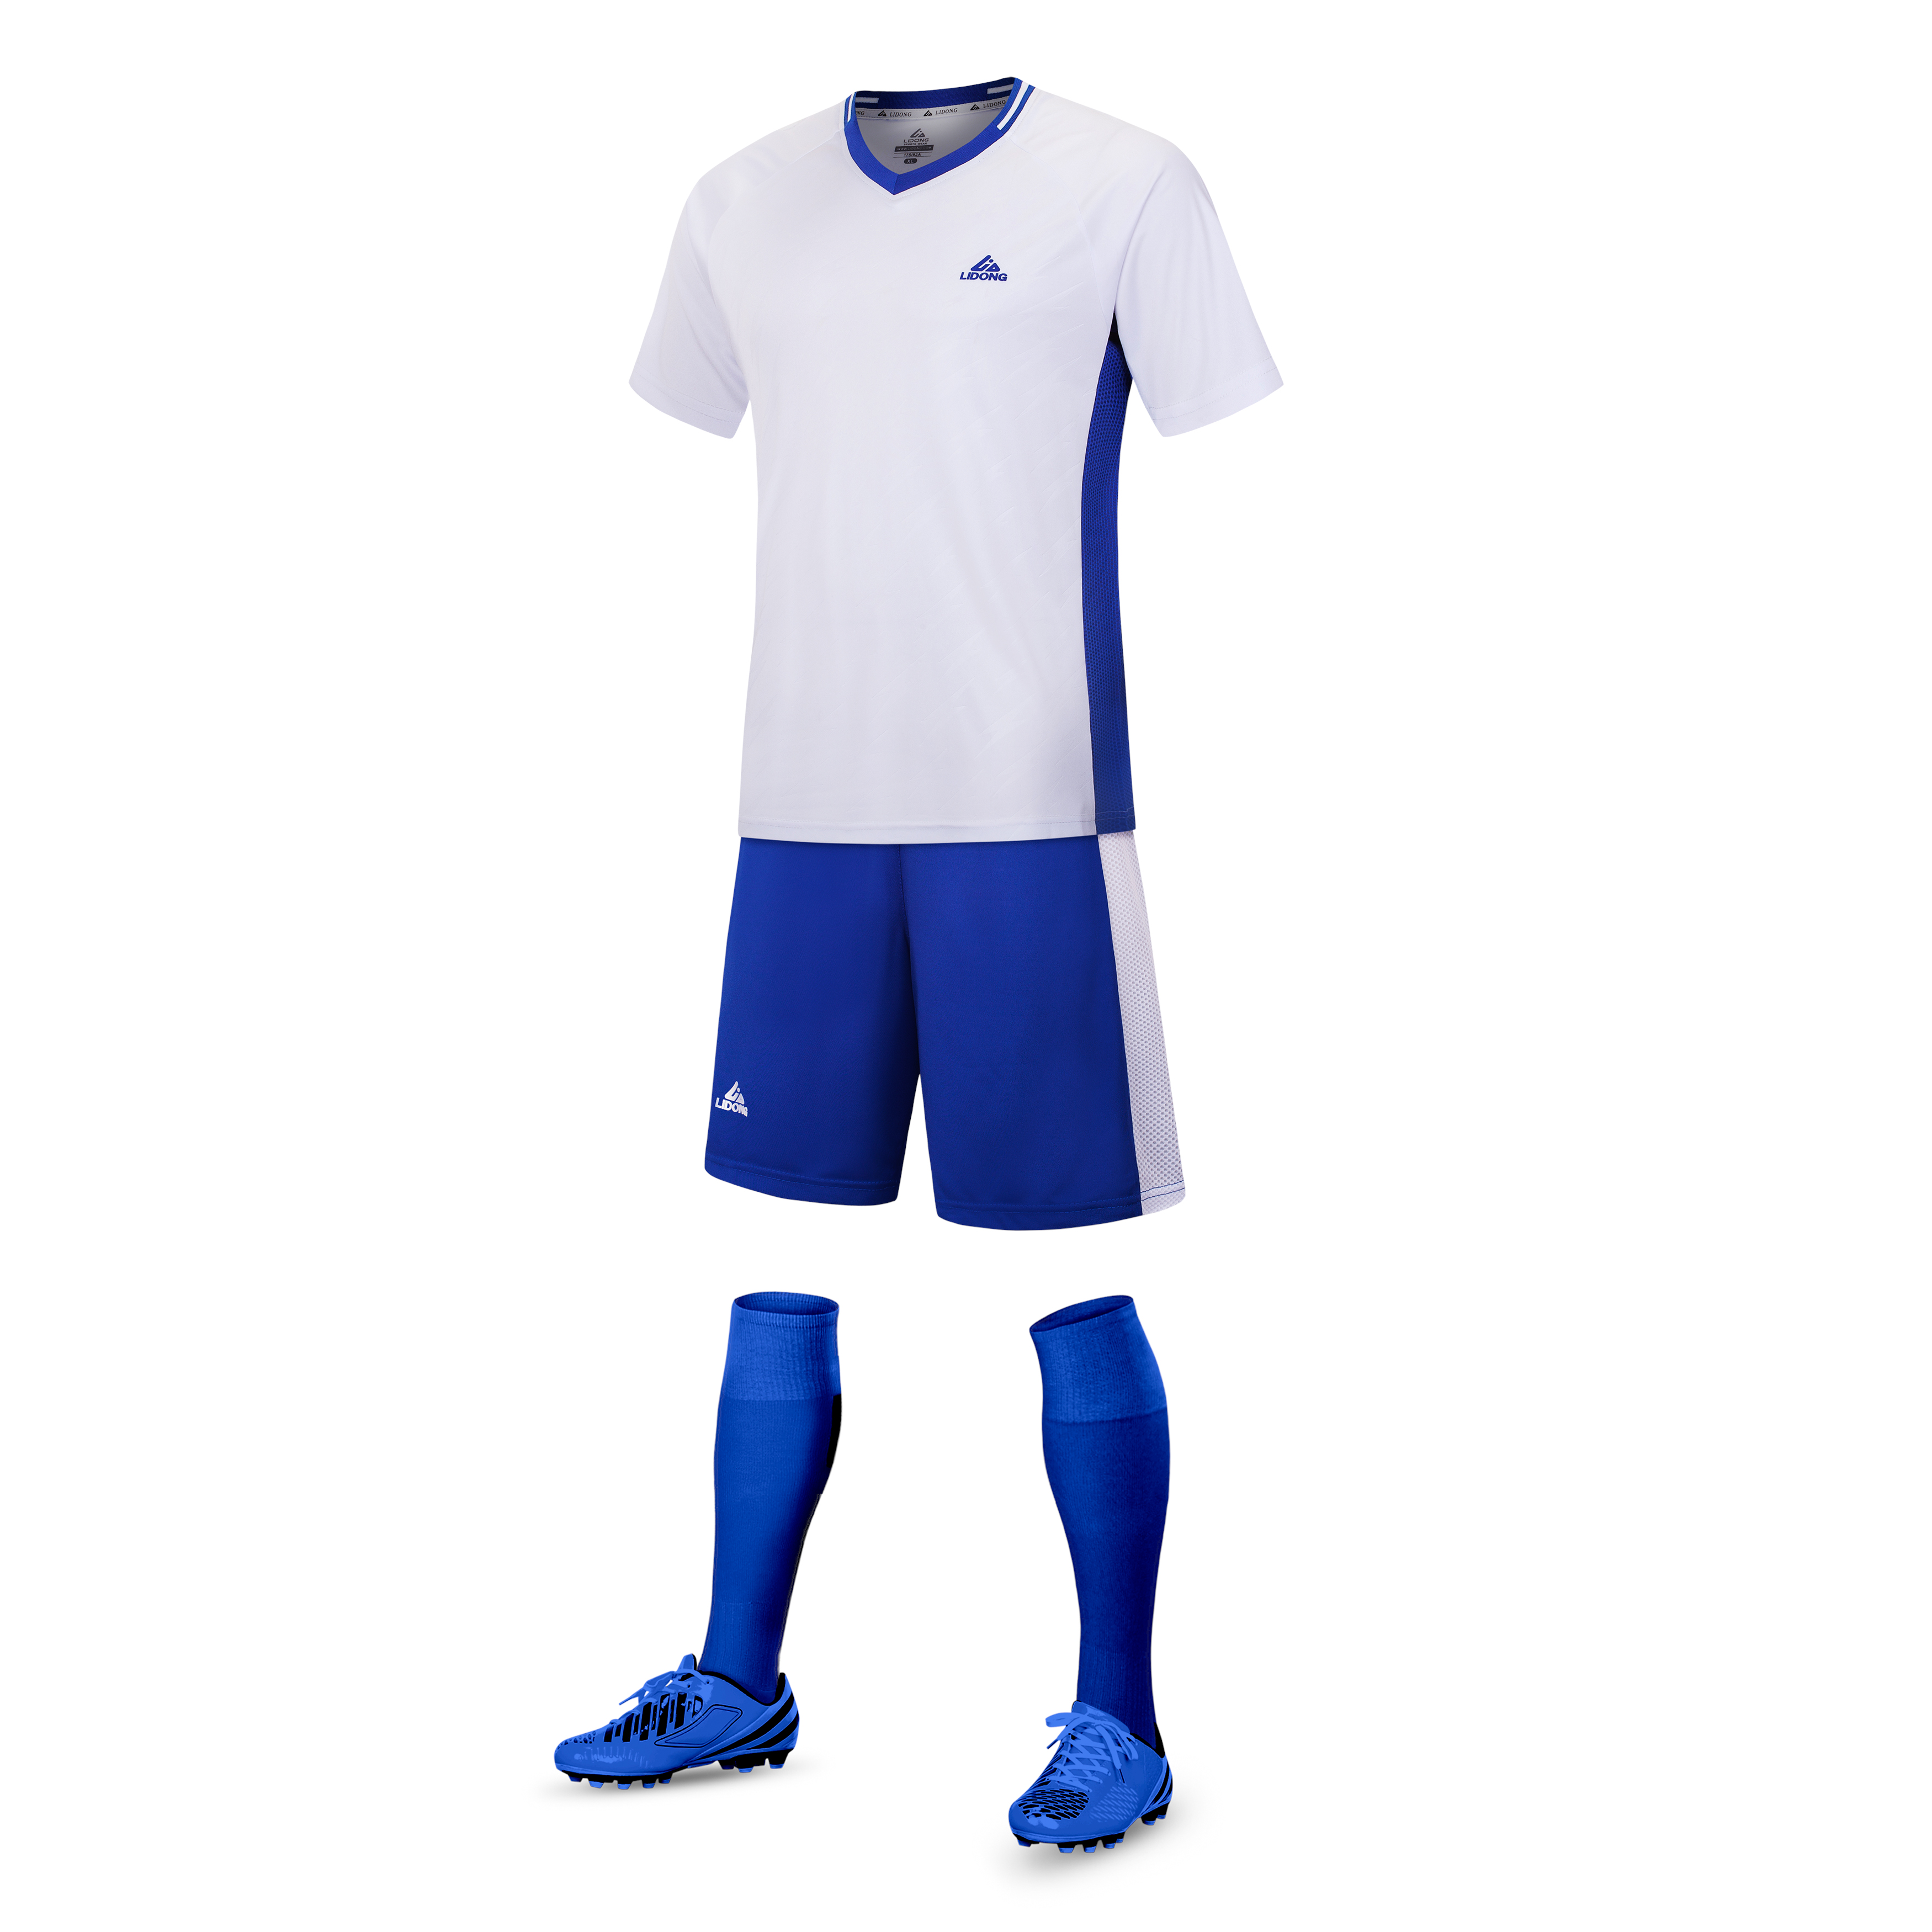 8075d3bdd2b China Apparel Soccer